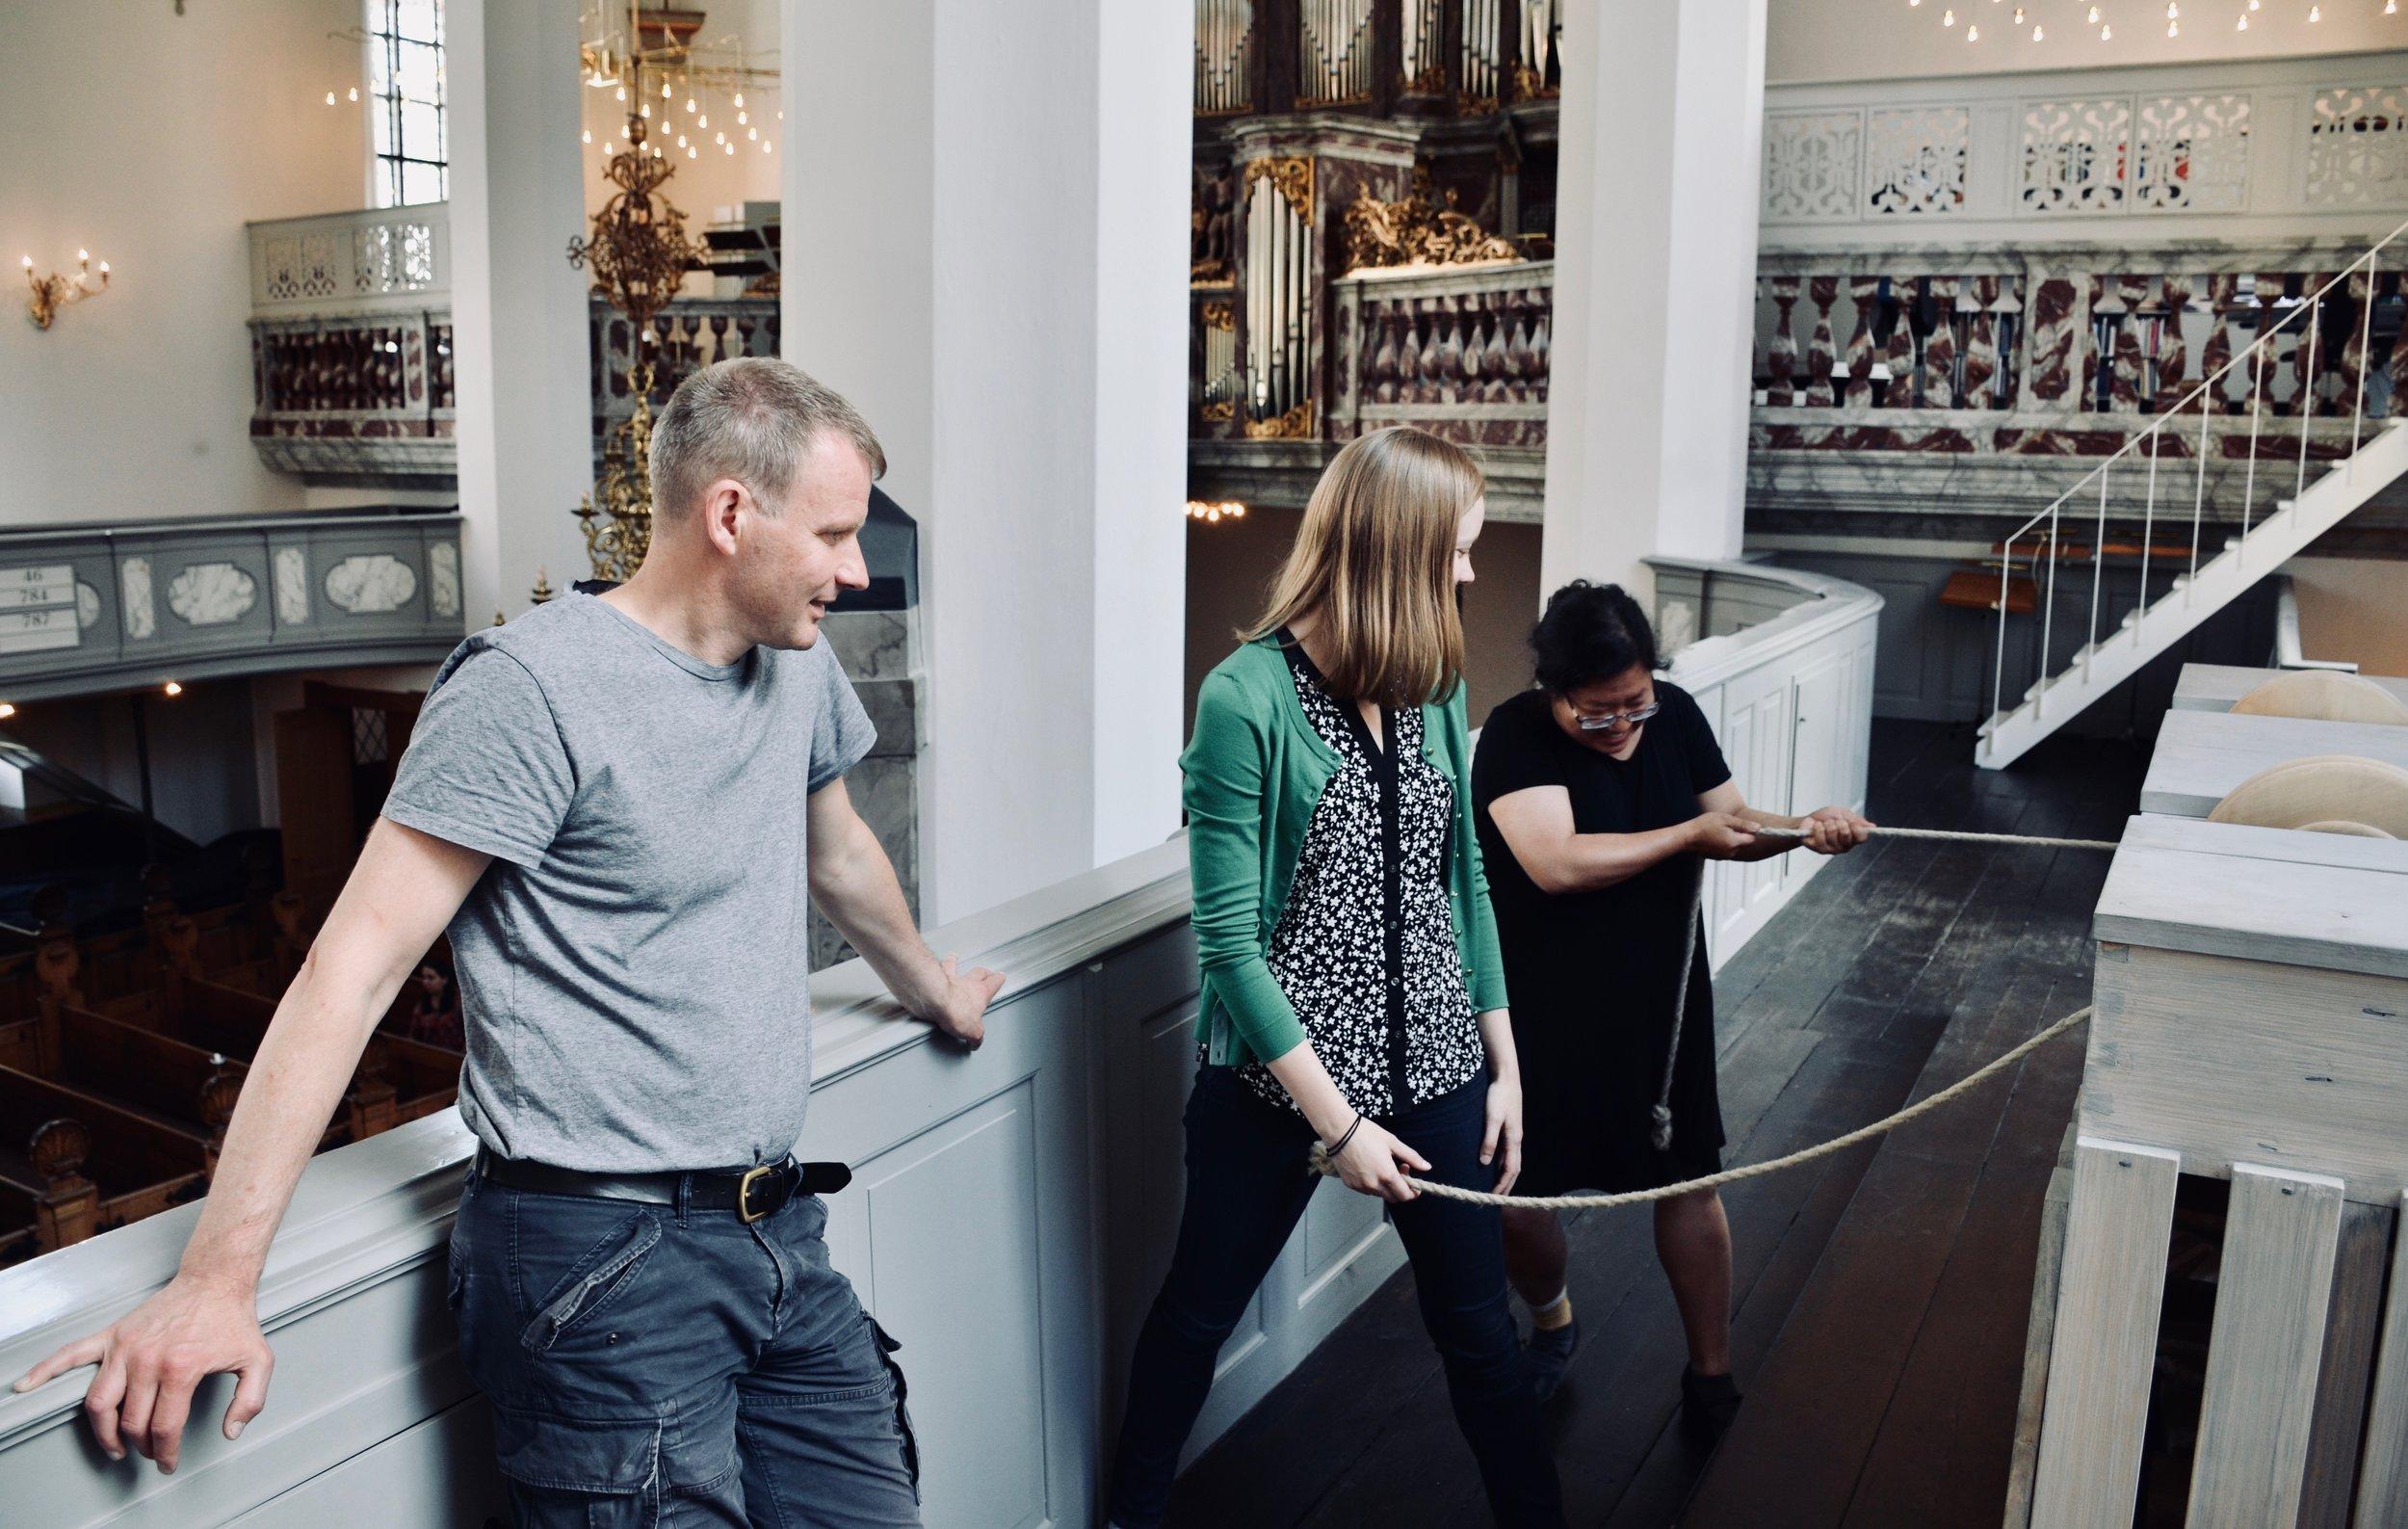 Jennifer Hsiao pumps the bellows for the Italian baroque organ in Trinitatis Kirke, Copenhagen.